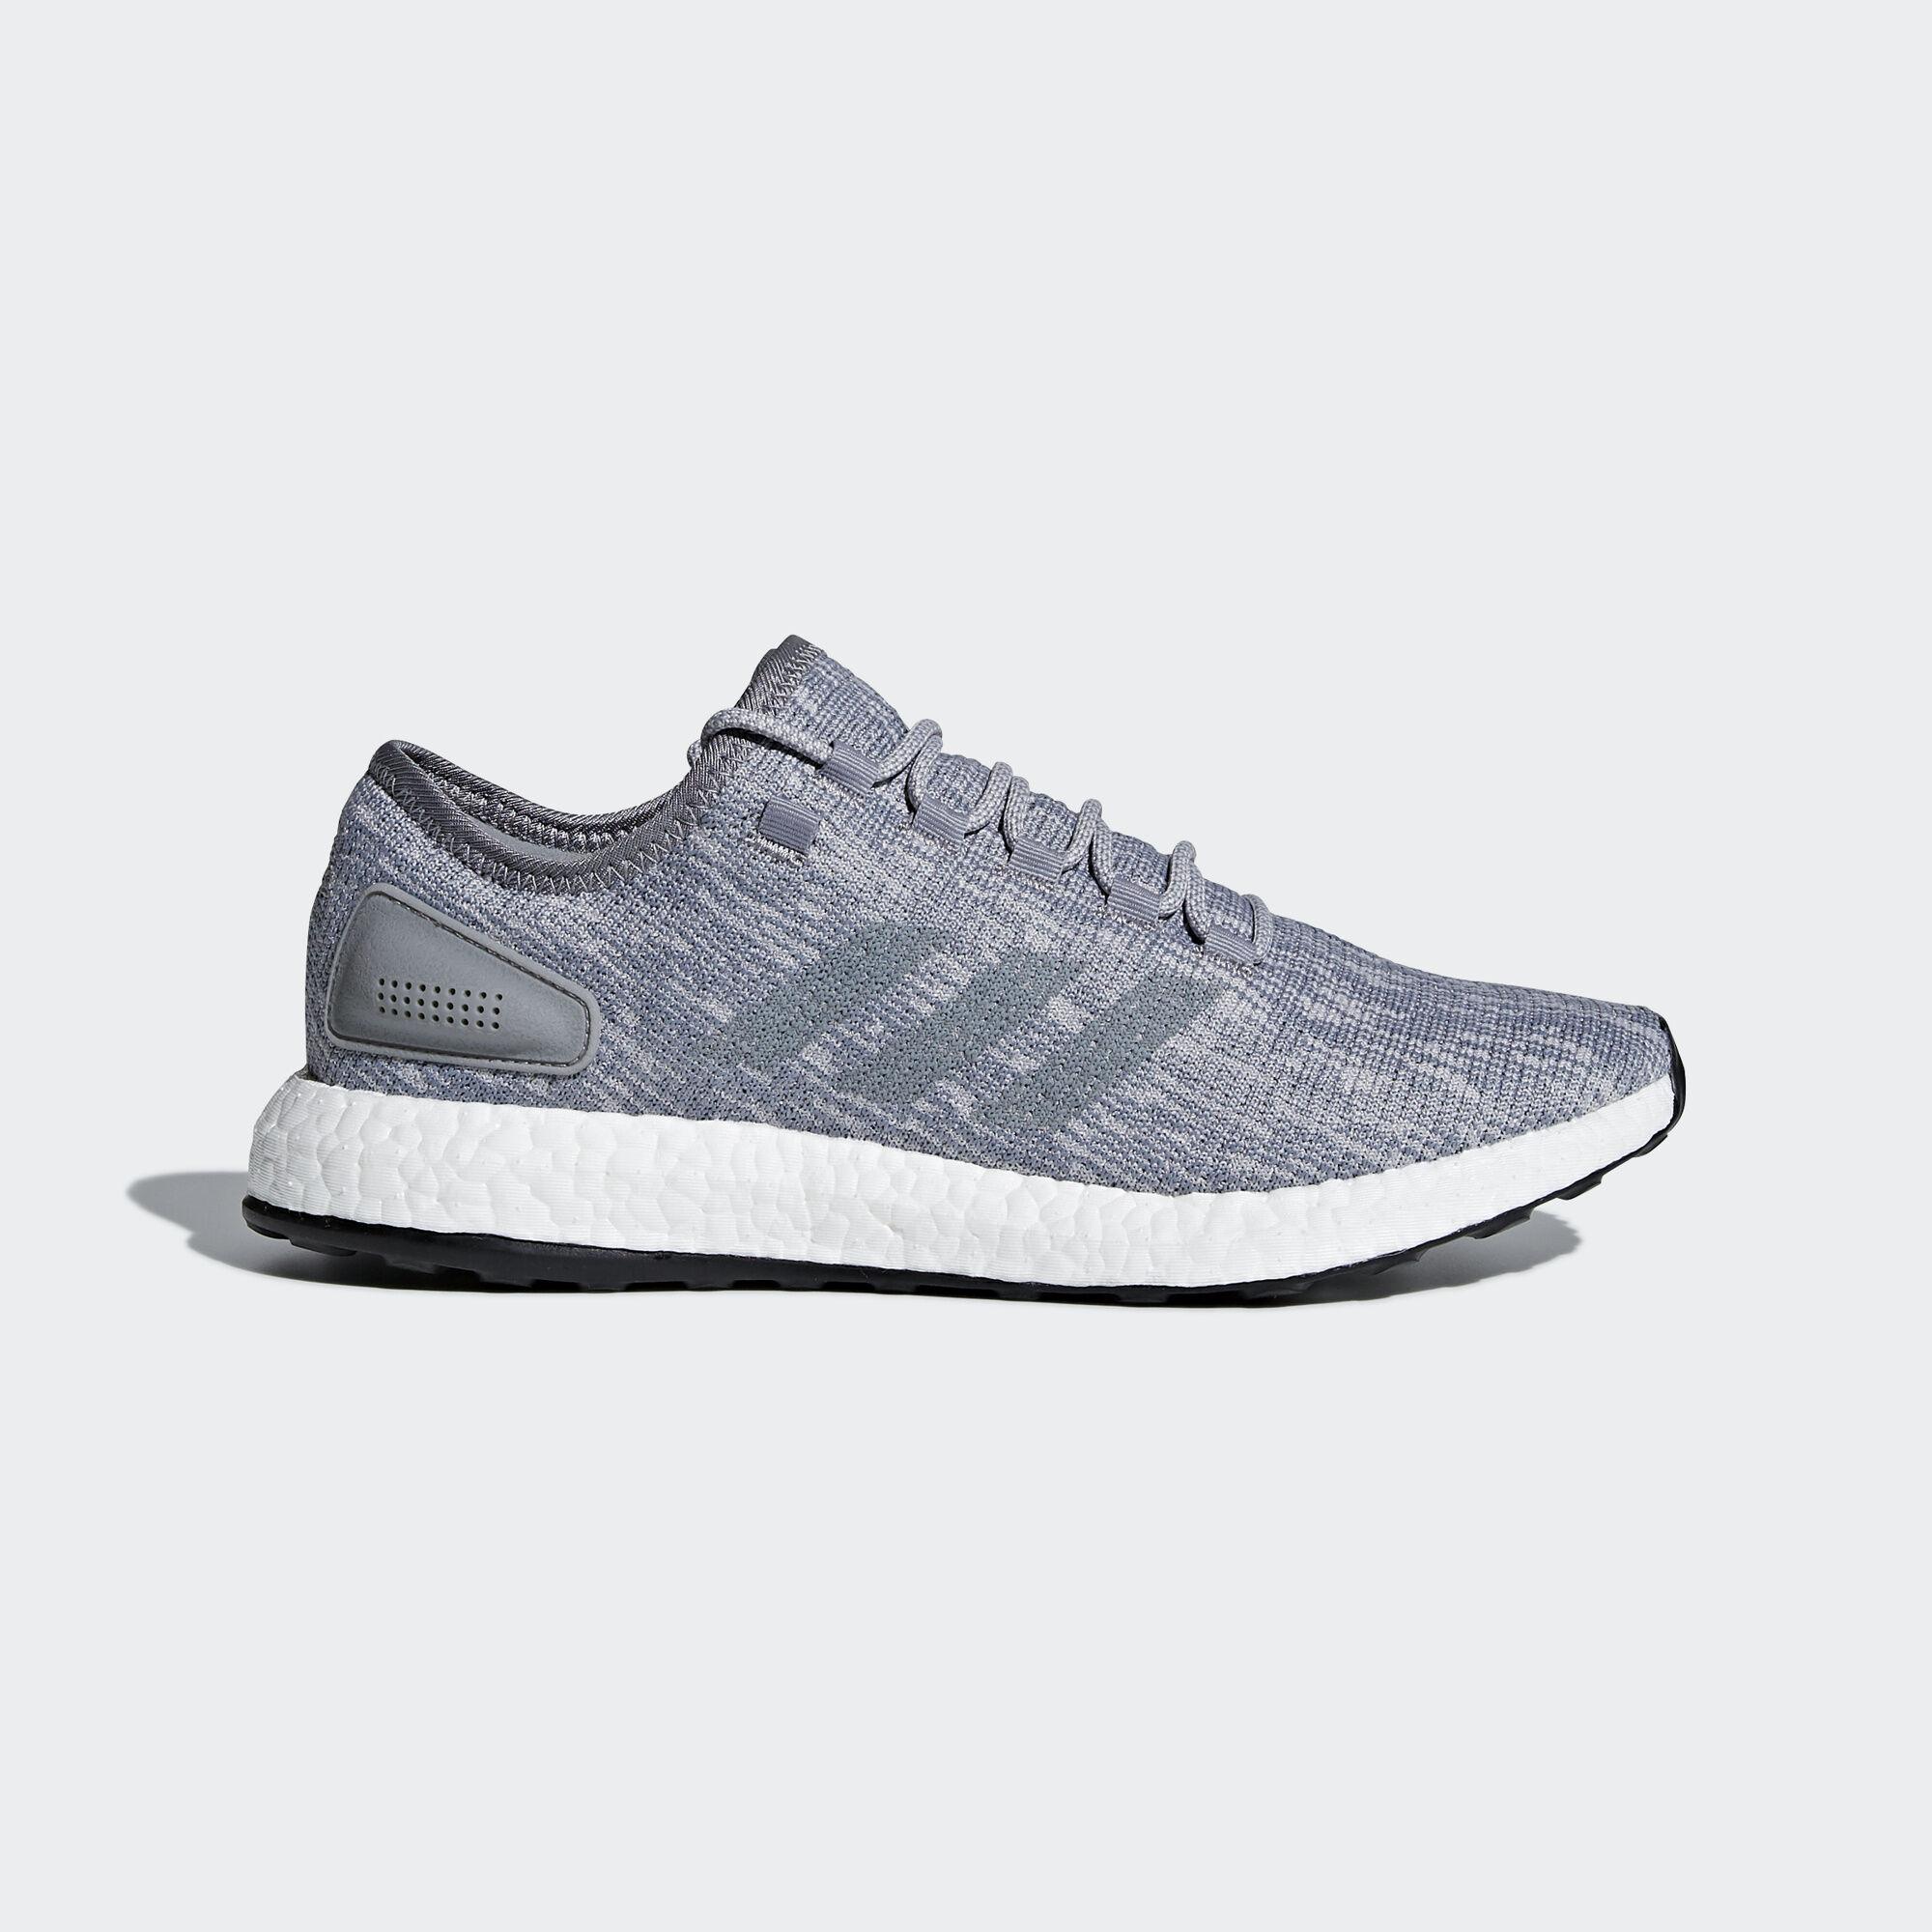 discount best store to get cheap sale latest adidas Running PureBOOST In Grey BB6278 73EhEVt6hc